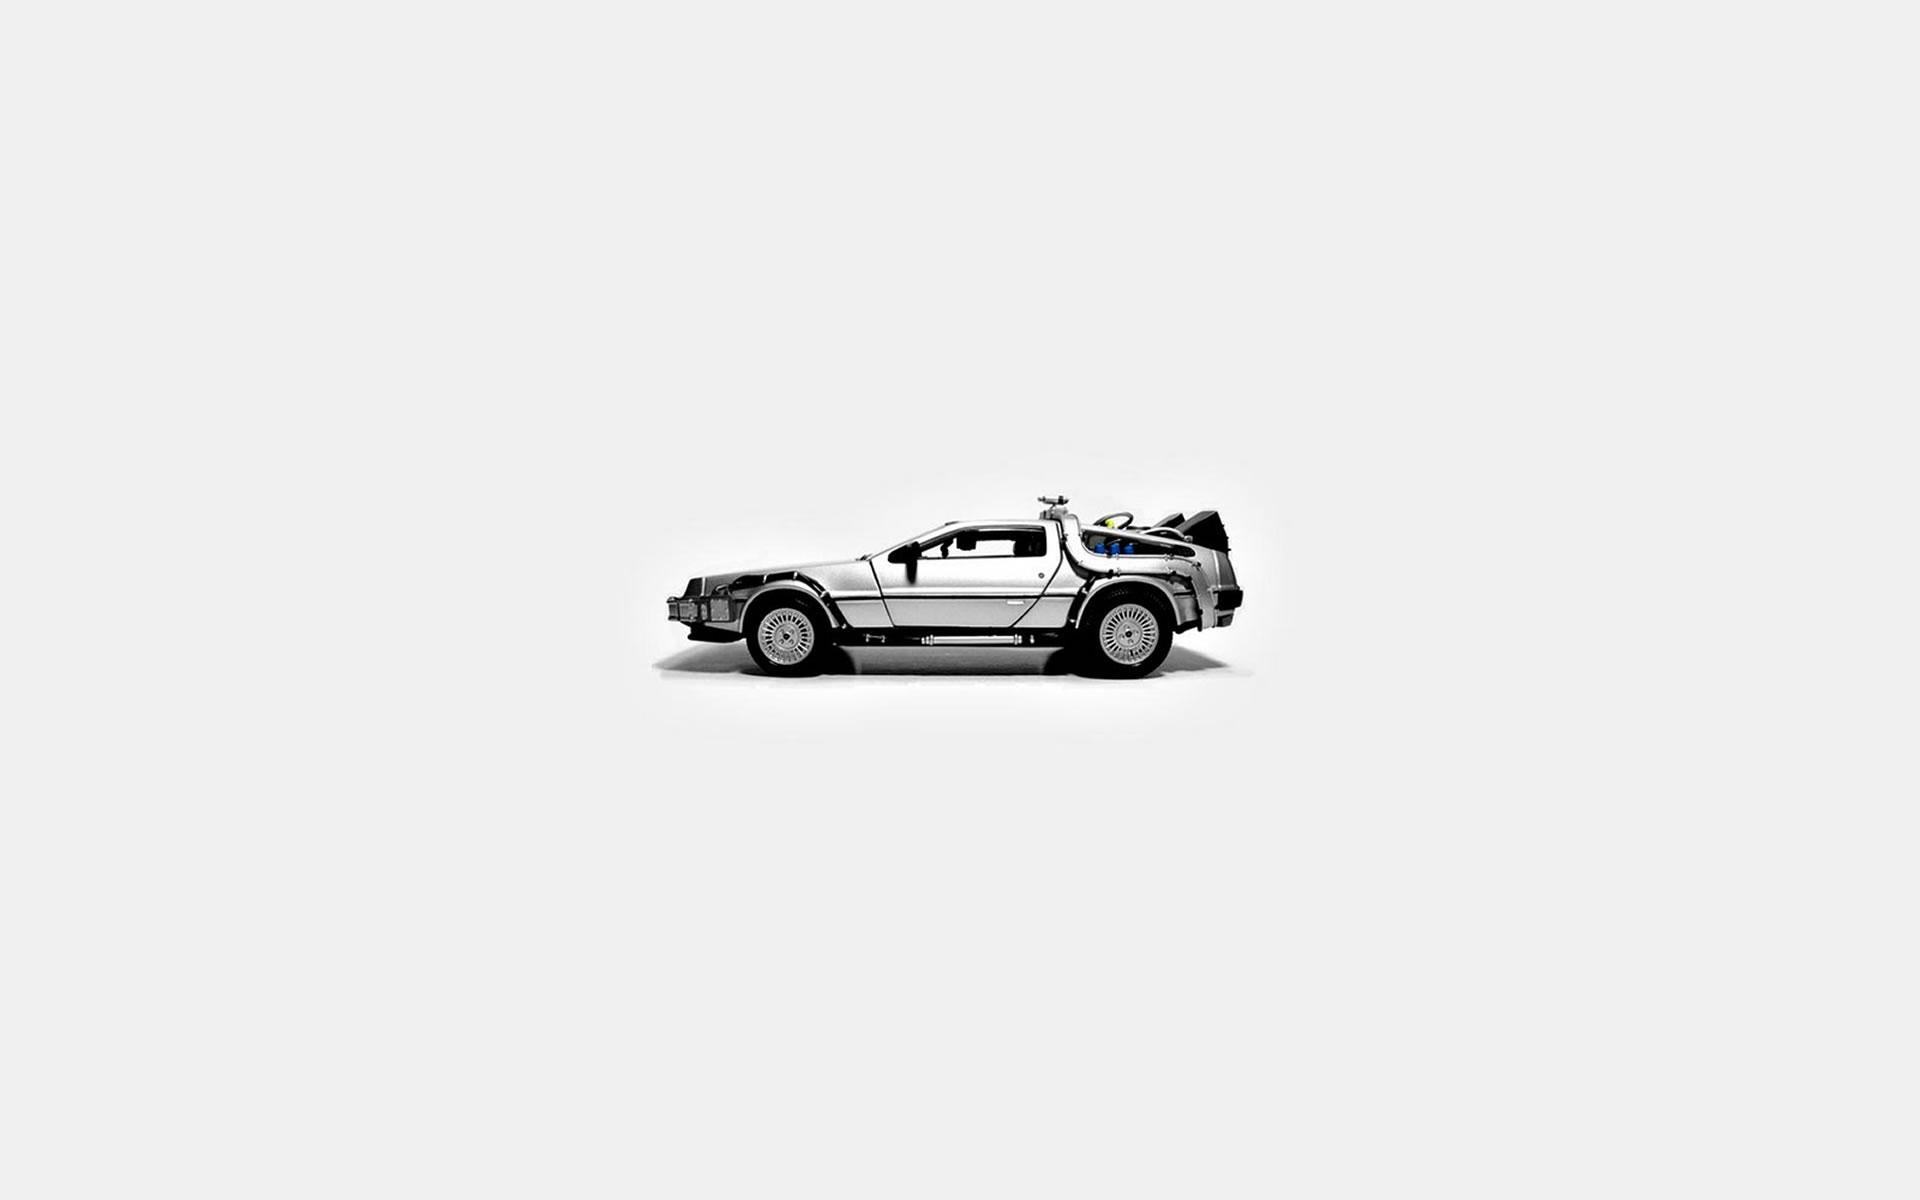 Wallpaper DeLorean DMC-12